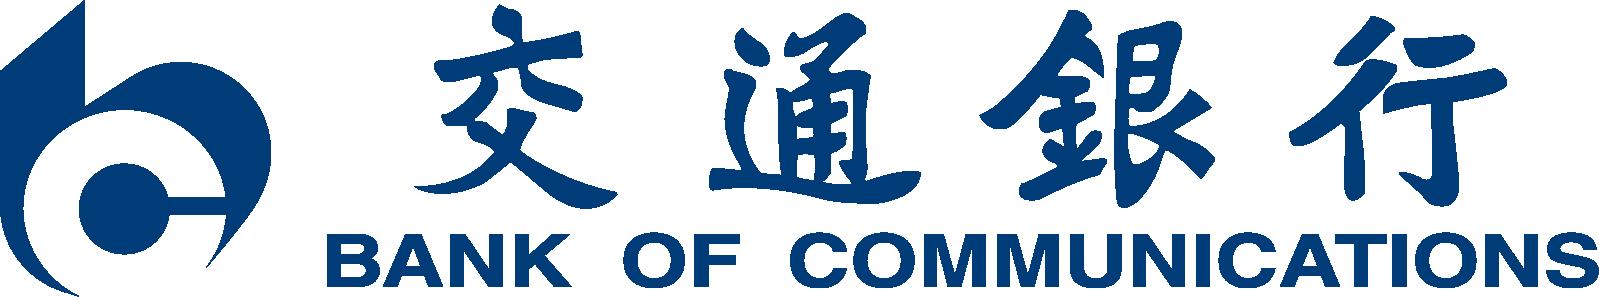 Bank of Communications Logo png